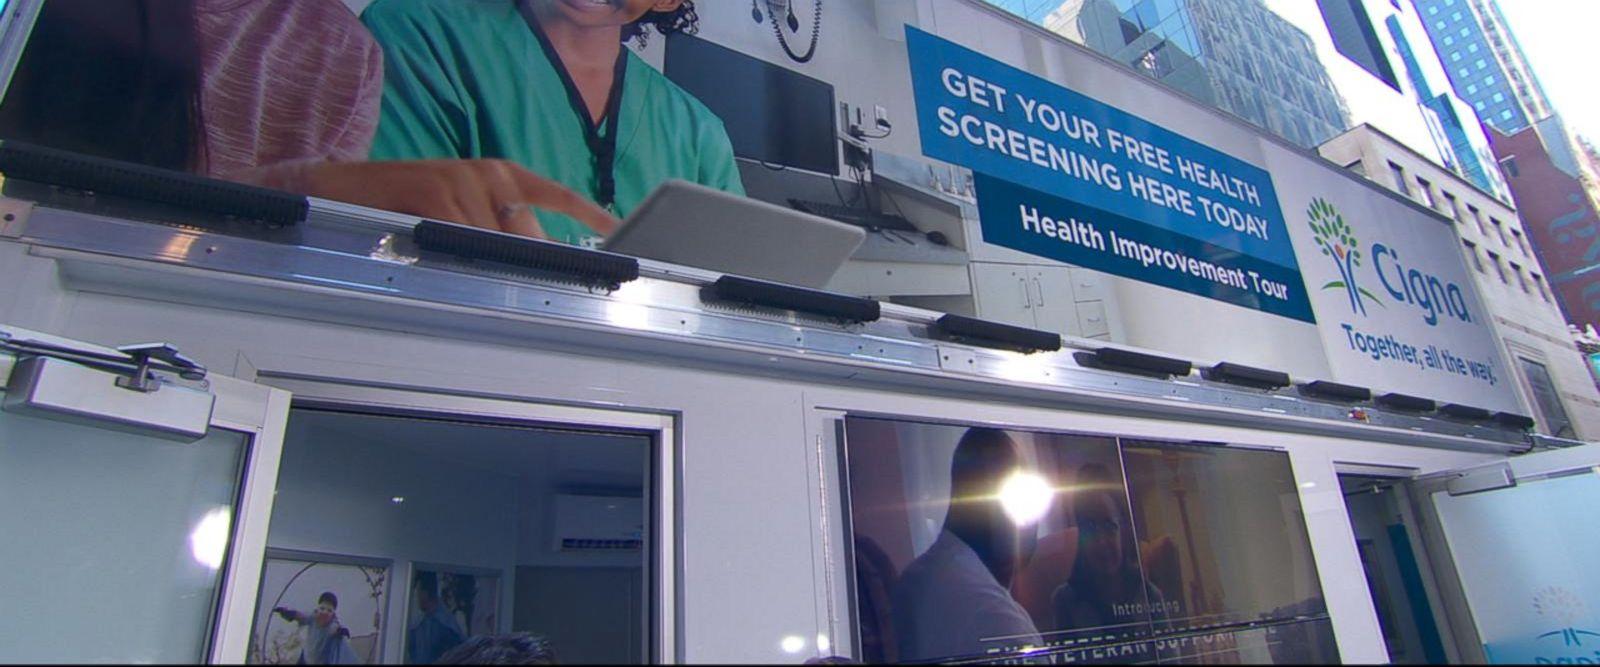 VIDEO: Inside Cigna's Health Improvement Tour van